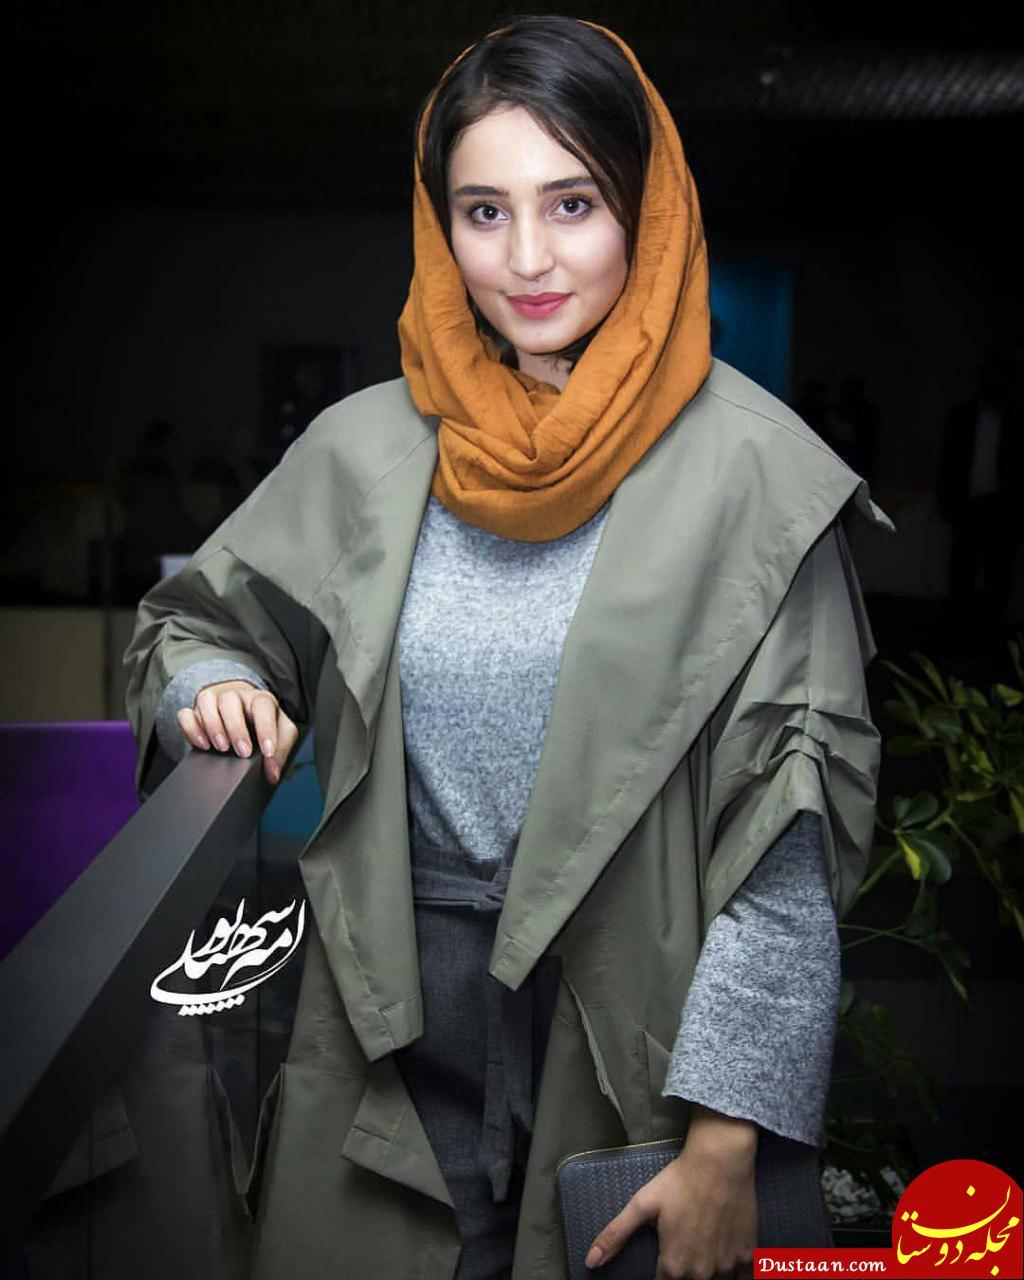 www.dustaan.com سها نیاستی | بیوگرافی و عکس های سها نیاستی بازیگر فیلم سال دوم دانشکده من